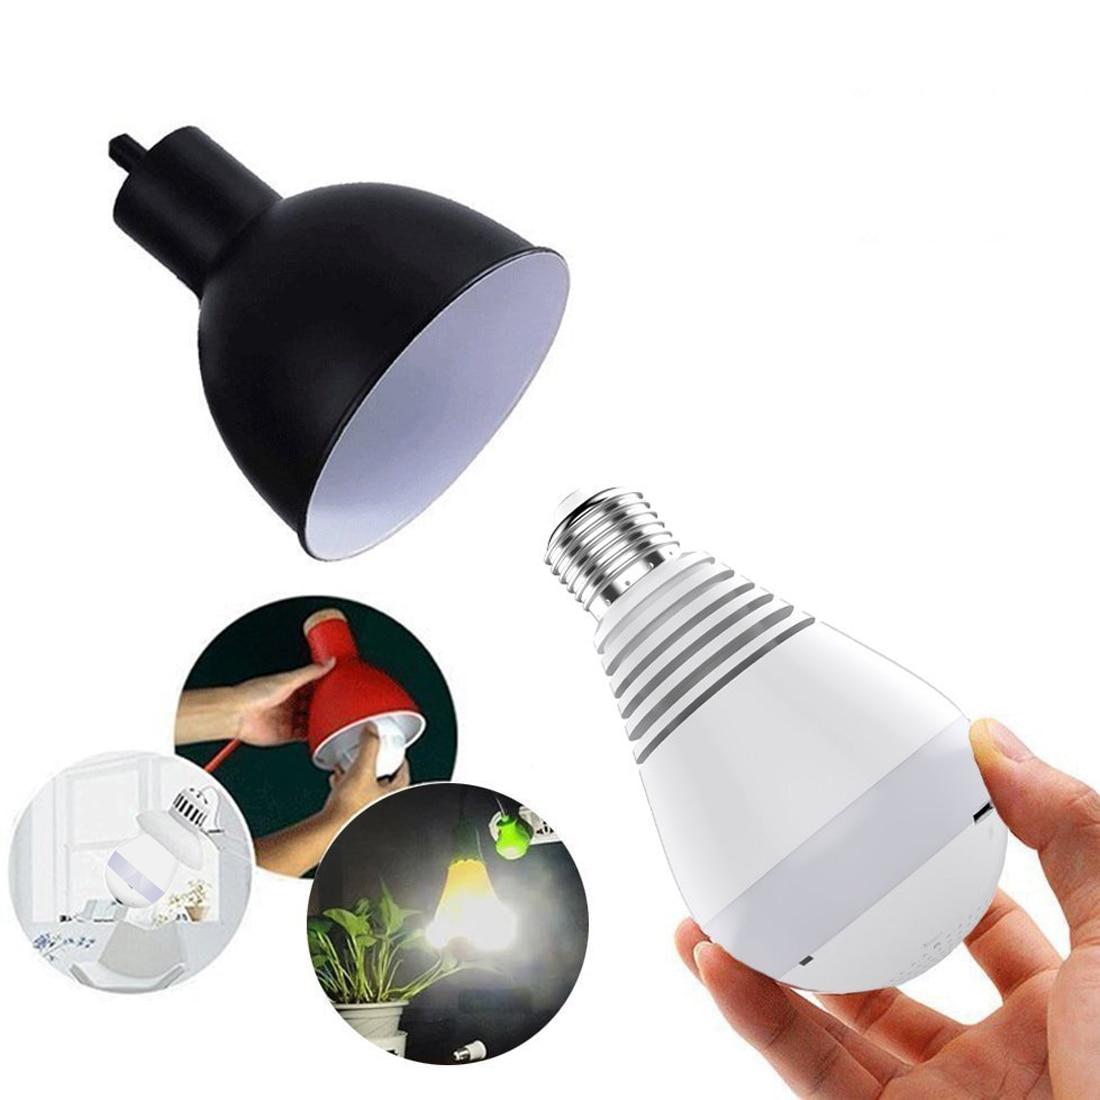 font b Wireless b font 960P 360 degree IP Camera Bulb Light FishEye Smart Home